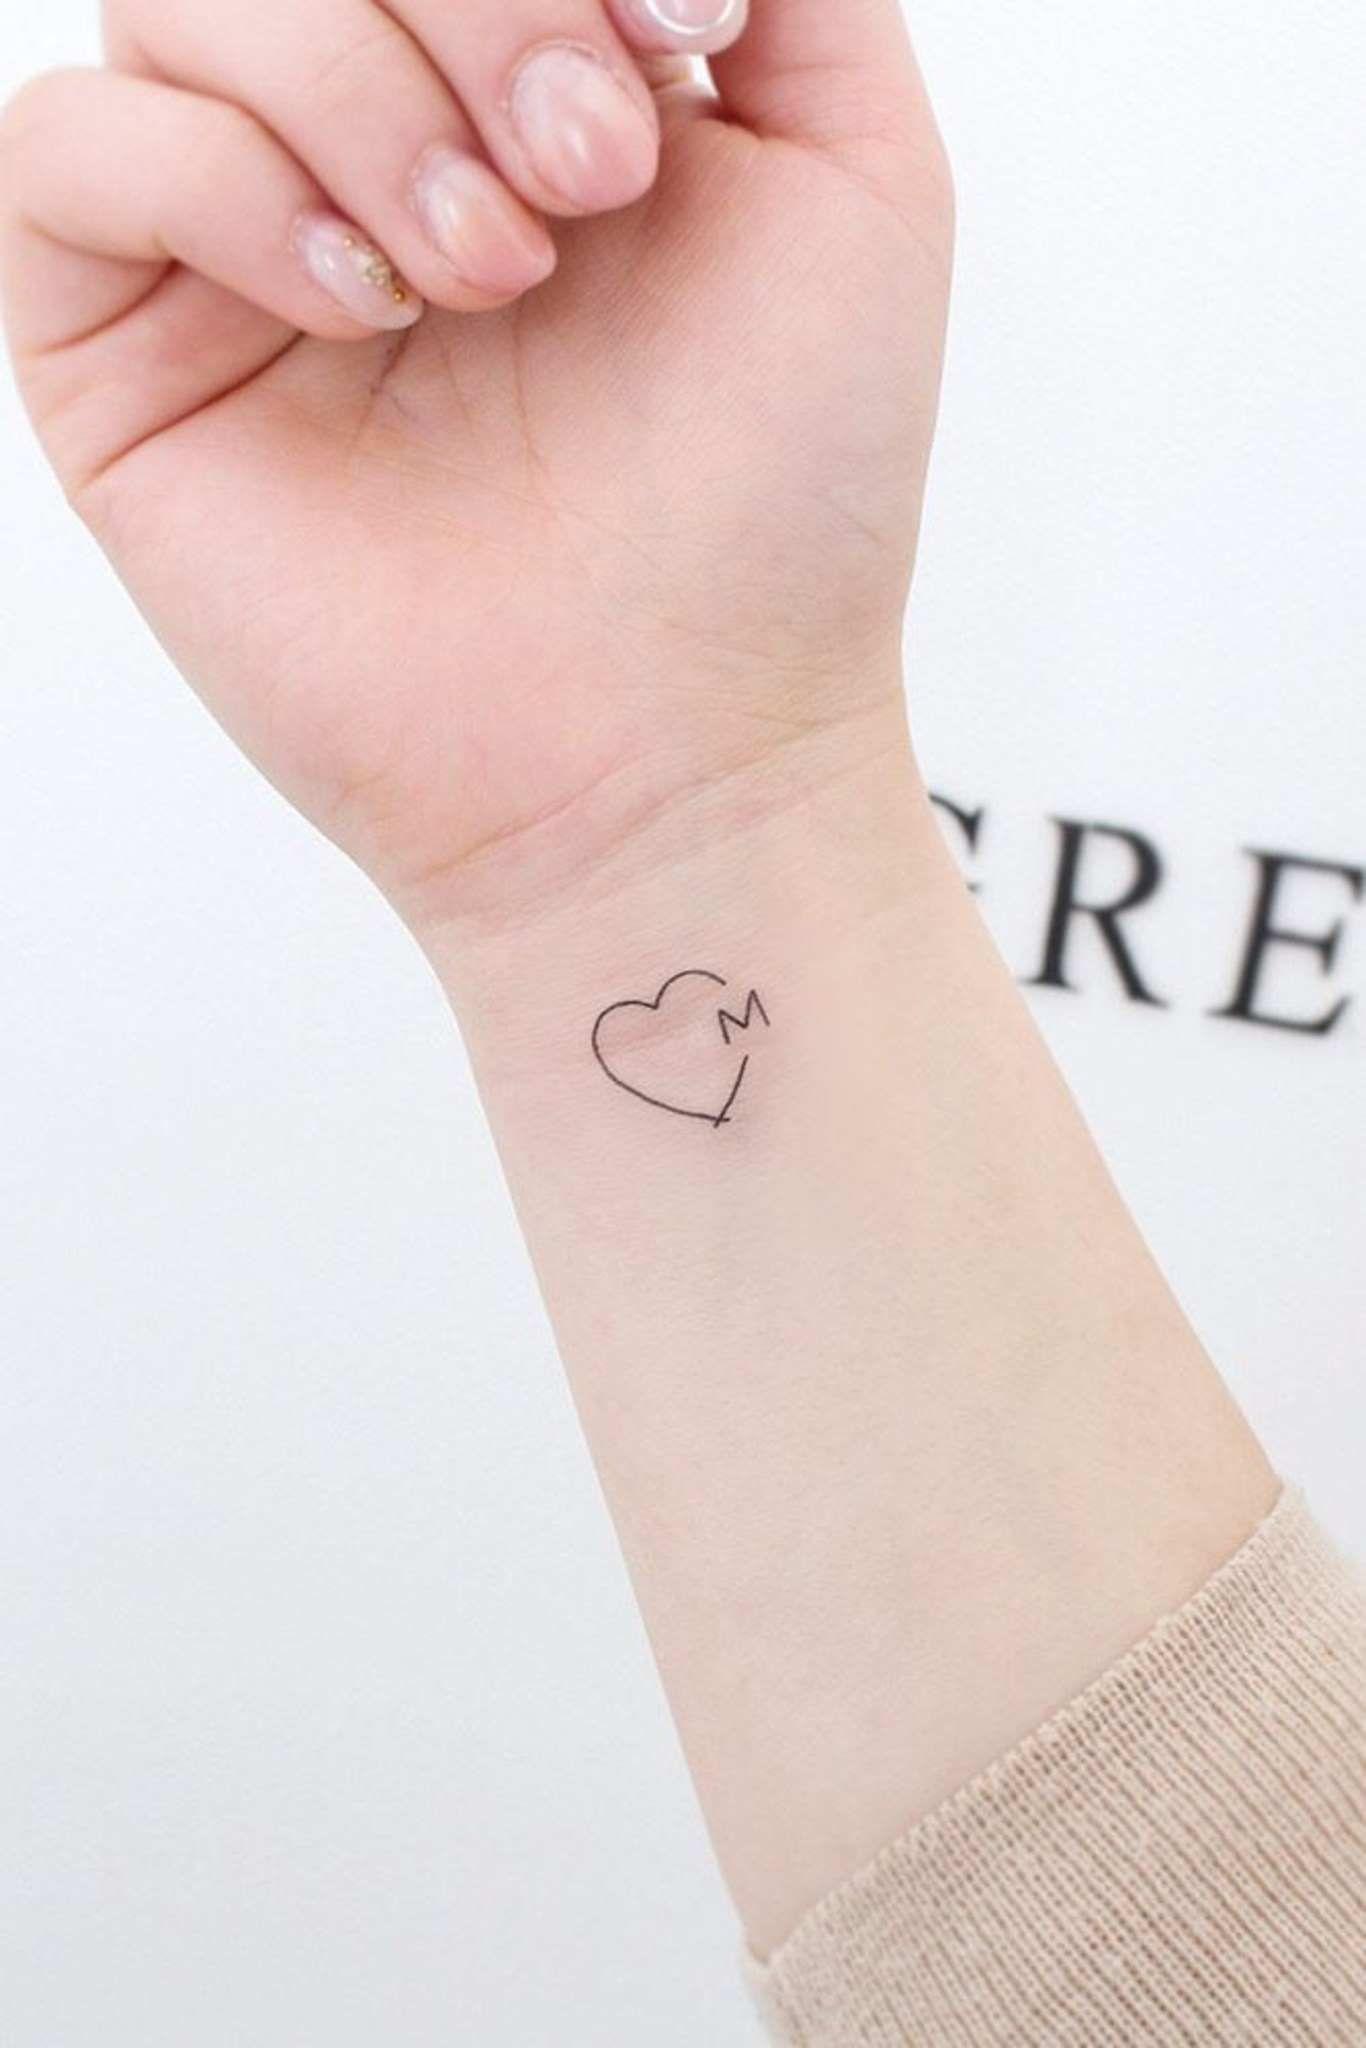 Rakkaus Tatouage Signification Et Representations Variees Tatouage Poignet Petit Tatouage Tatouage Discret